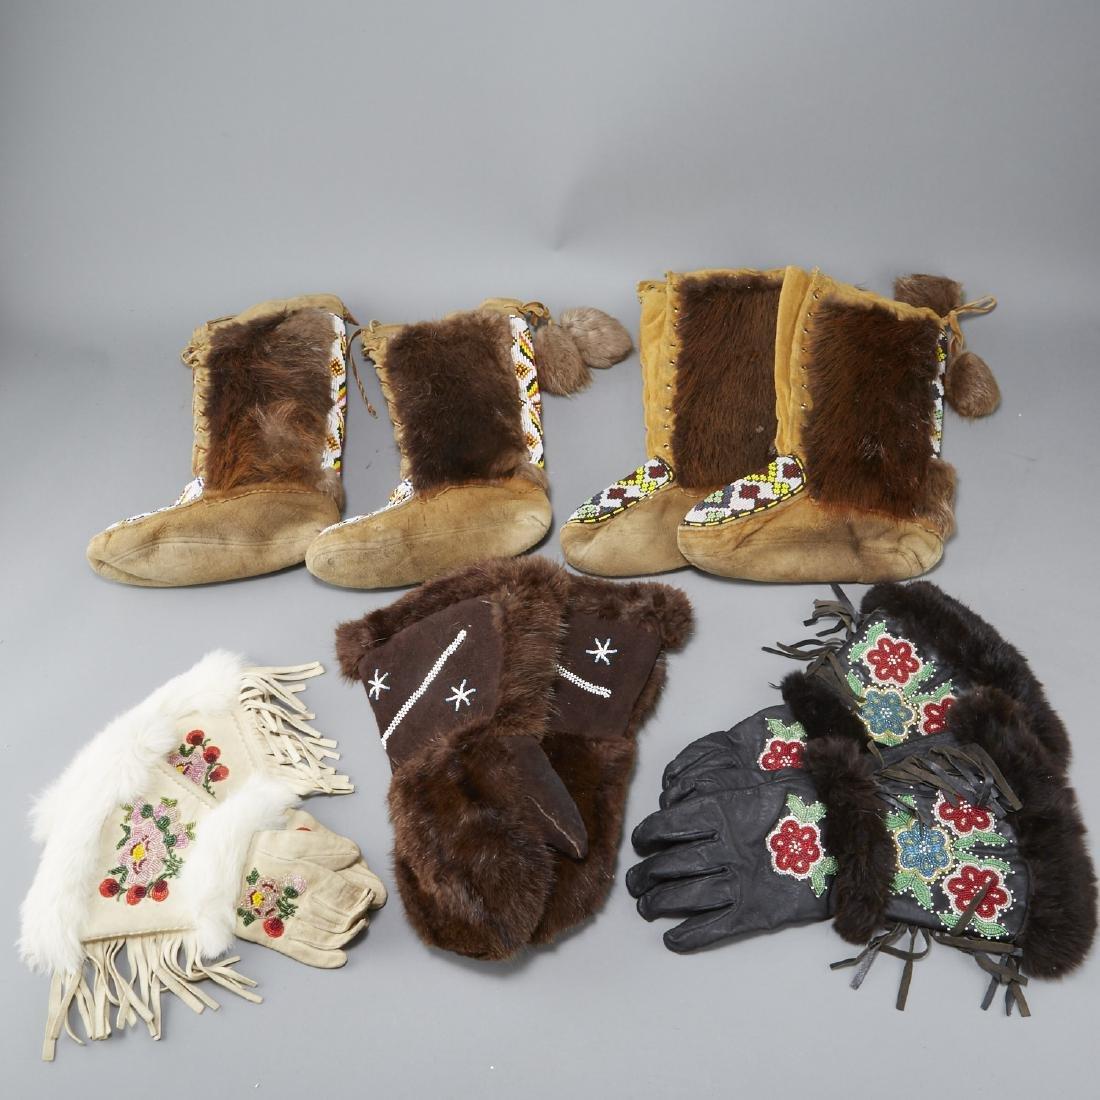 Group of 3 Pairs Gloves and 2 Pairs Mukluks